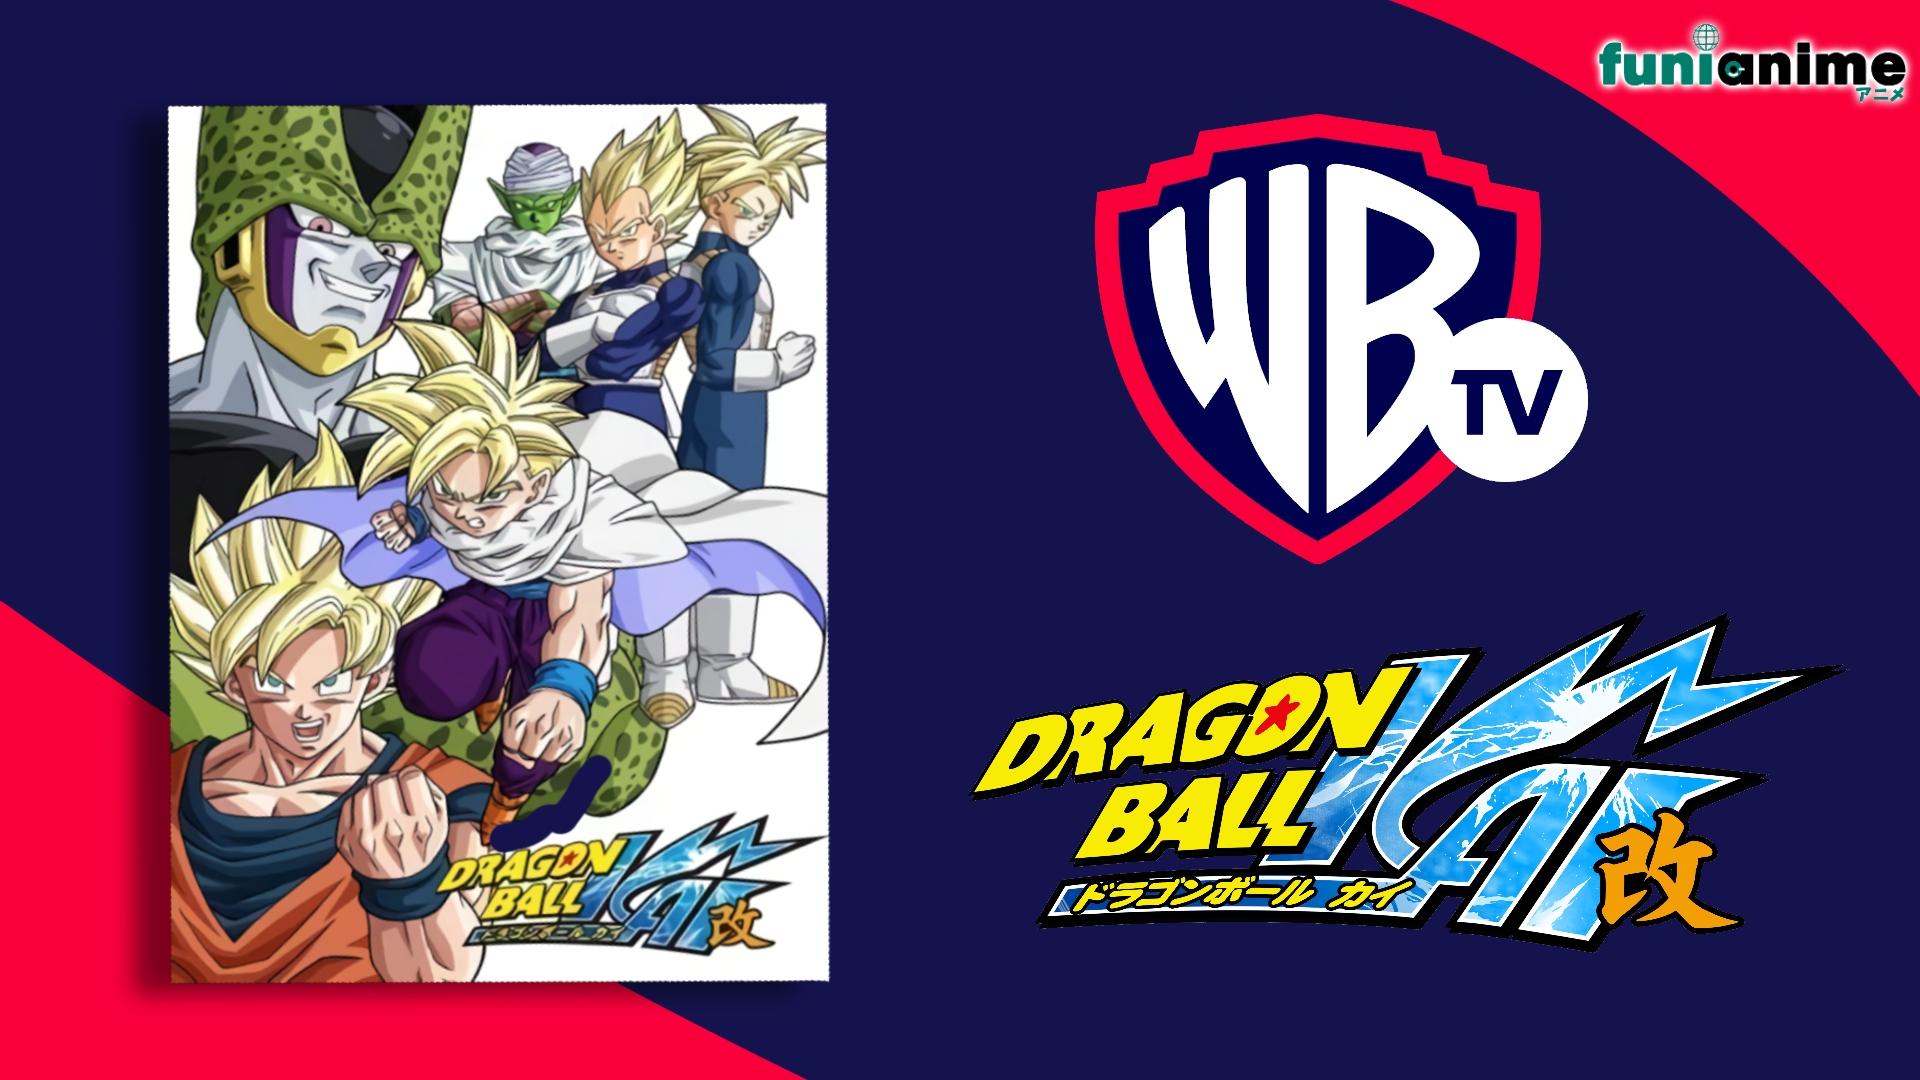 Dragon Ball Z Kai volverá a emitirse en cable a través de Warner Channel